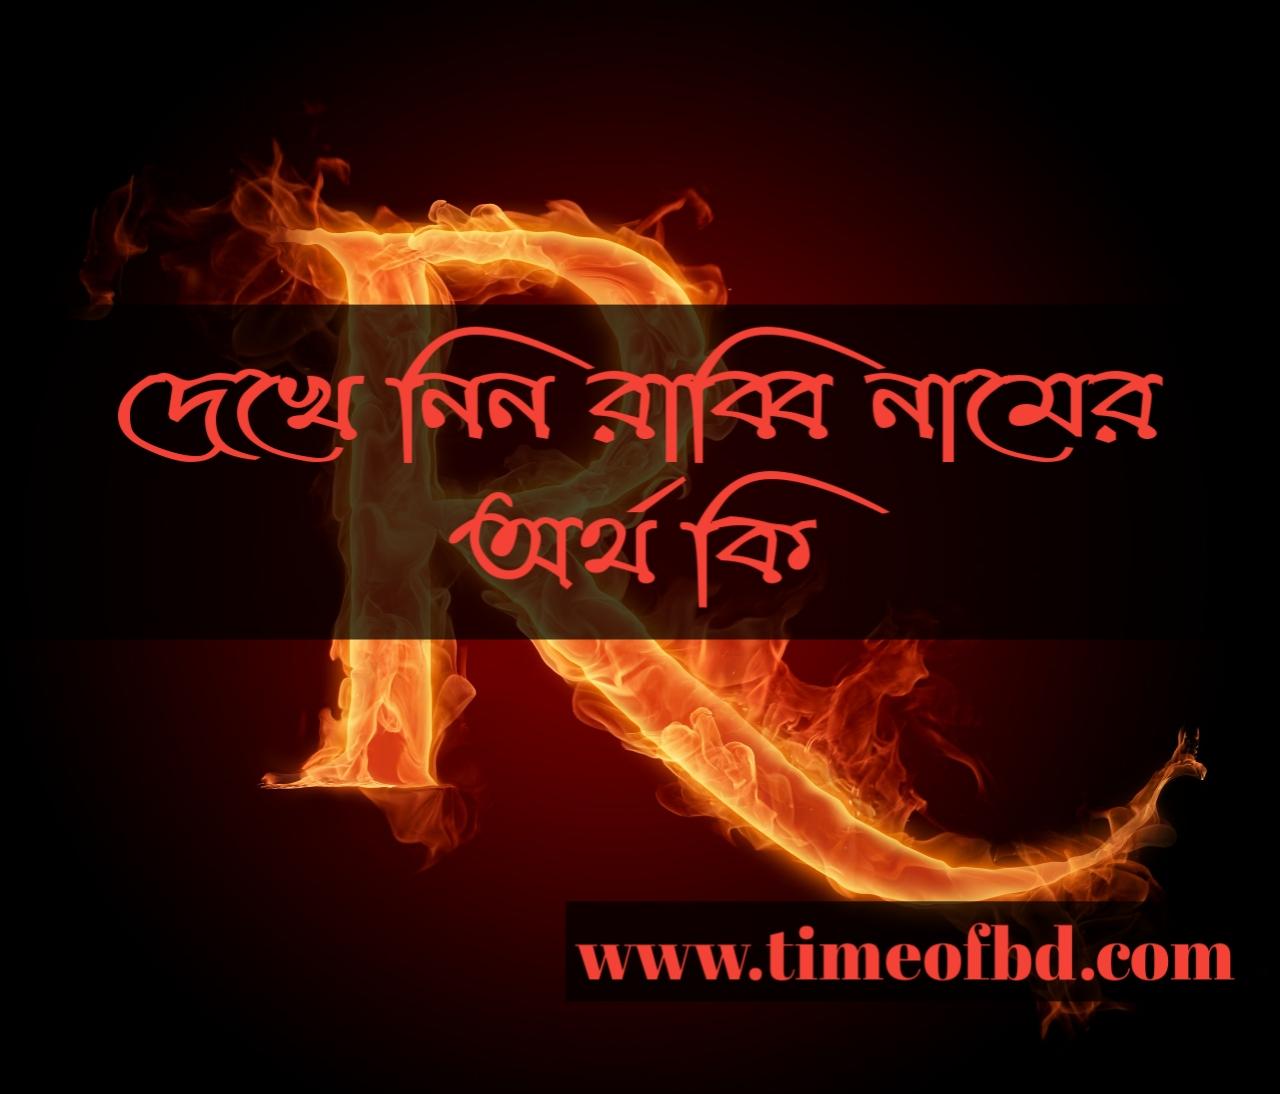 rabbi name meaning in Bengali, রাব্বি নামের অর্থ কি, রাব্বি নামের বাংলা অর্থ কি, রাব্বি নামের ইসলামিক অর্থ কি,